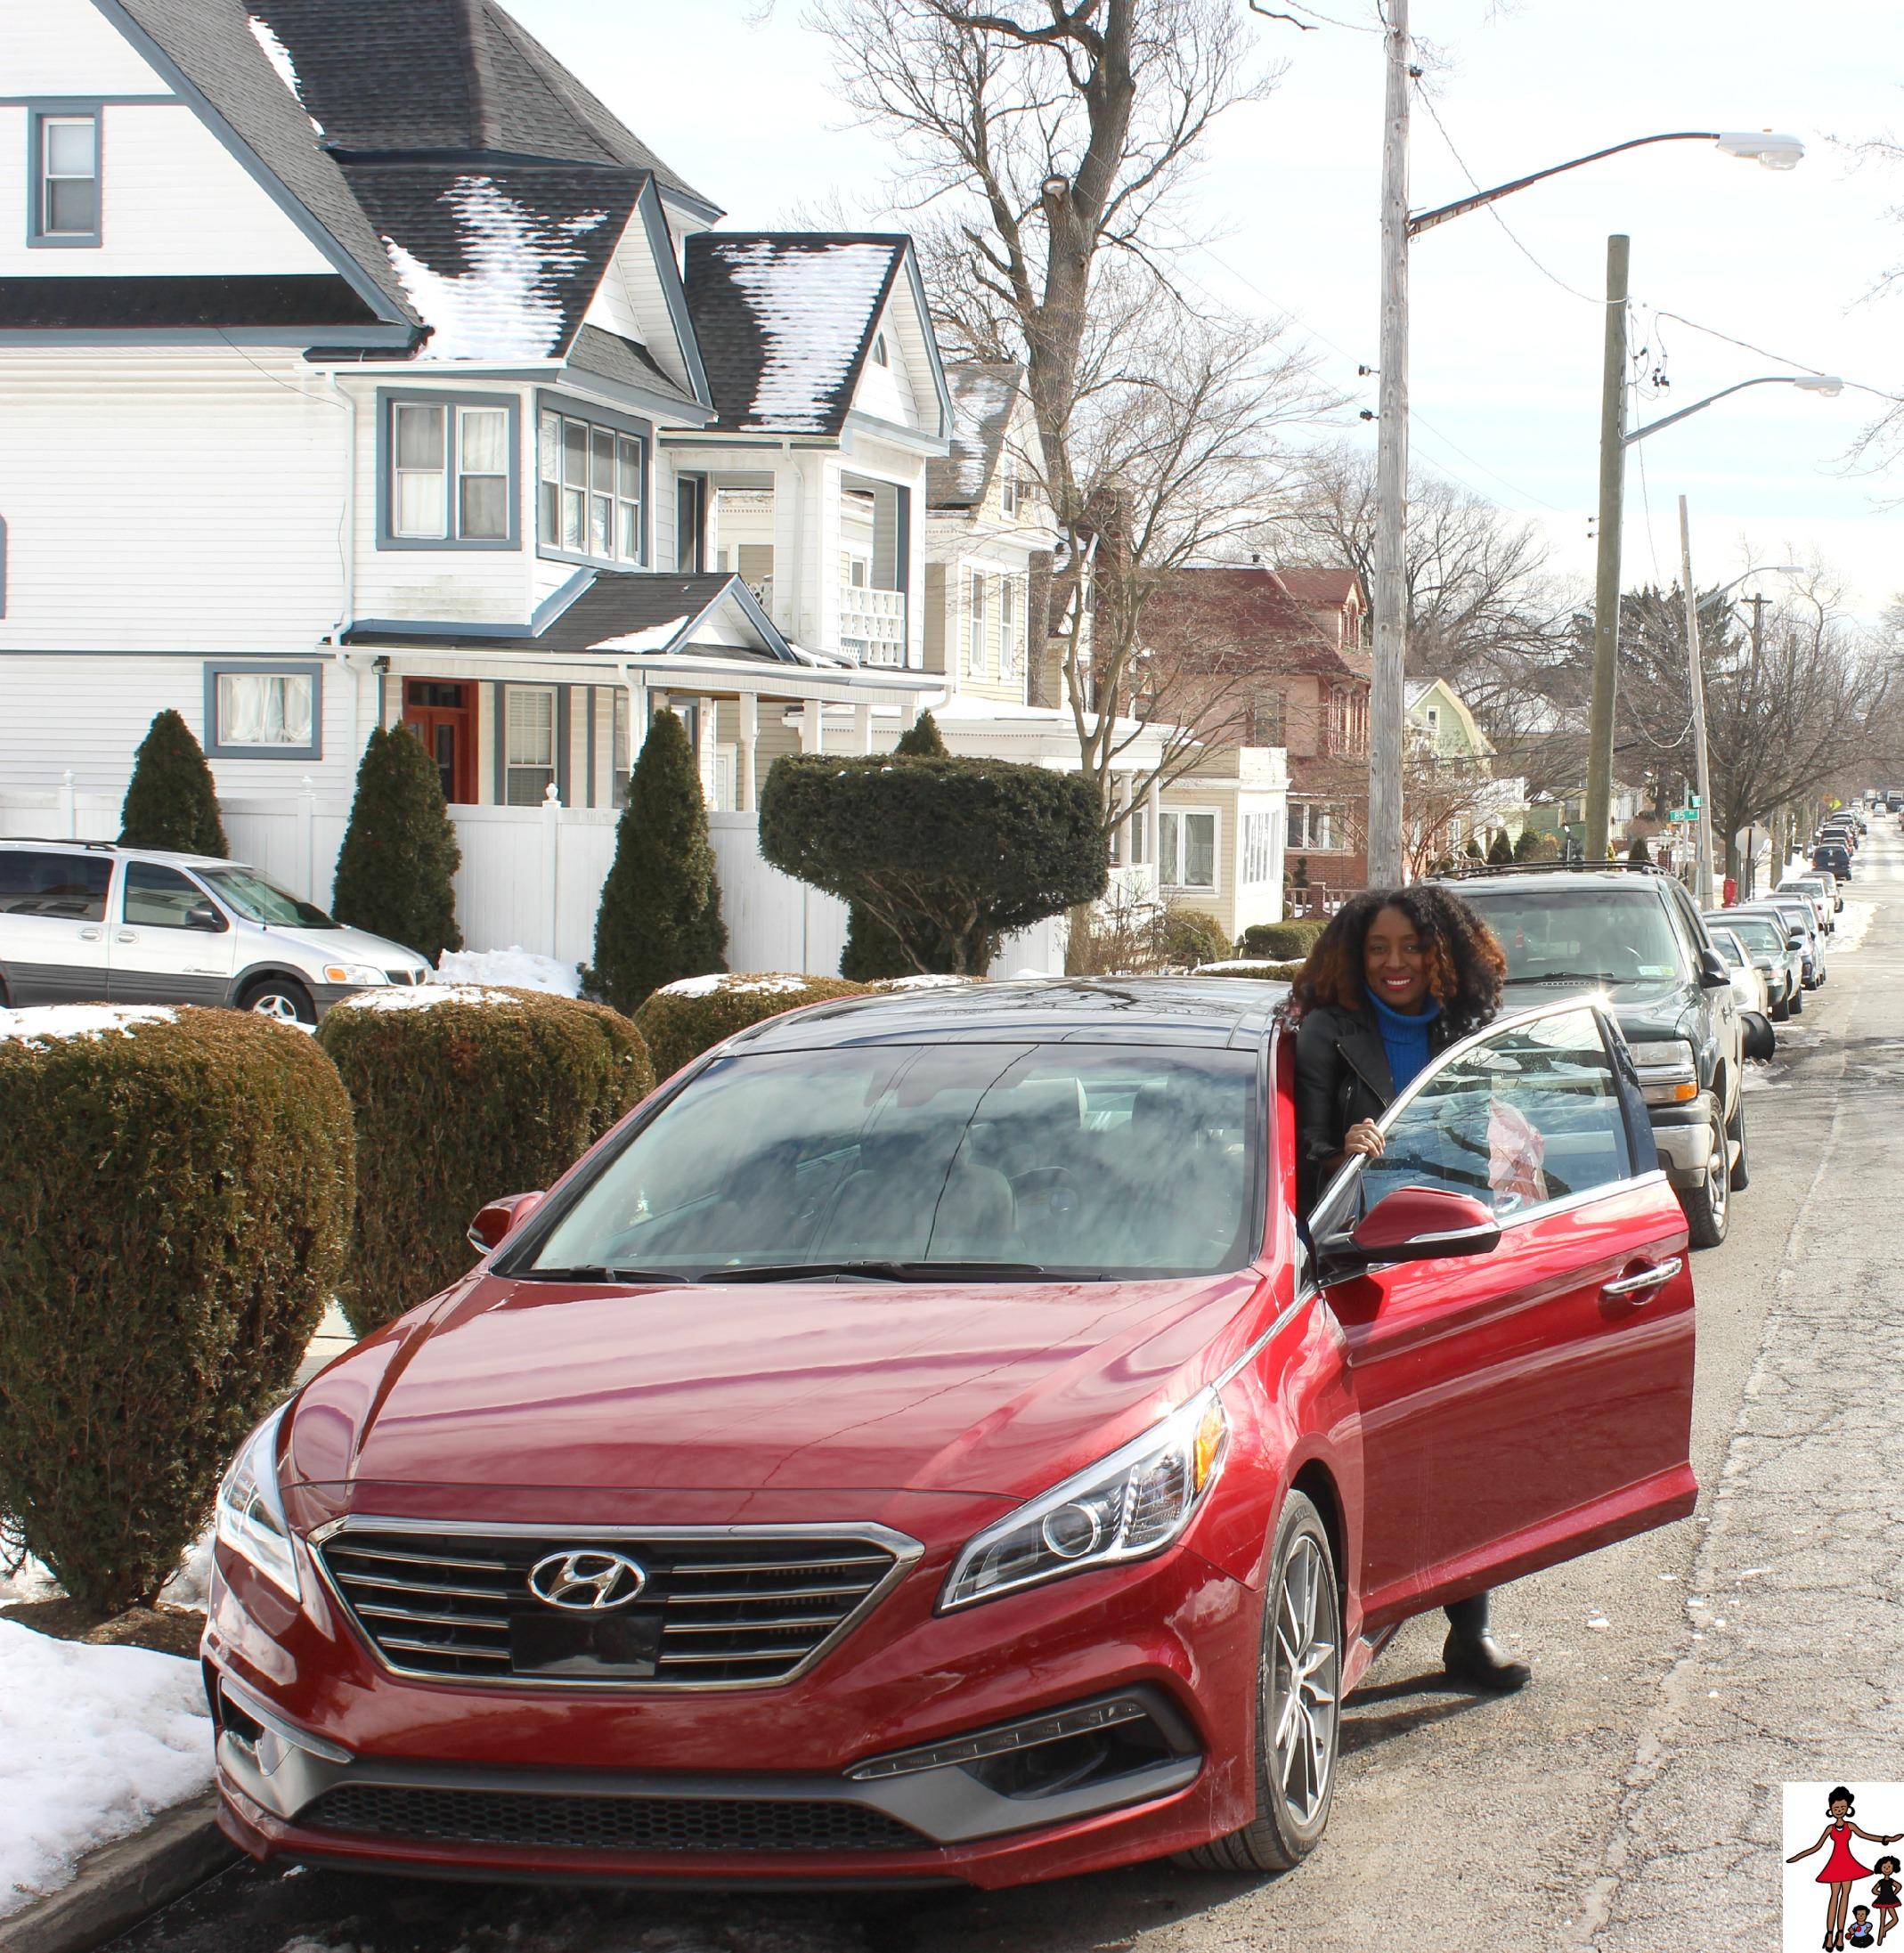 Hyundai Sonata 2015 Review: 2015 Hyundai Sonata Sport Review